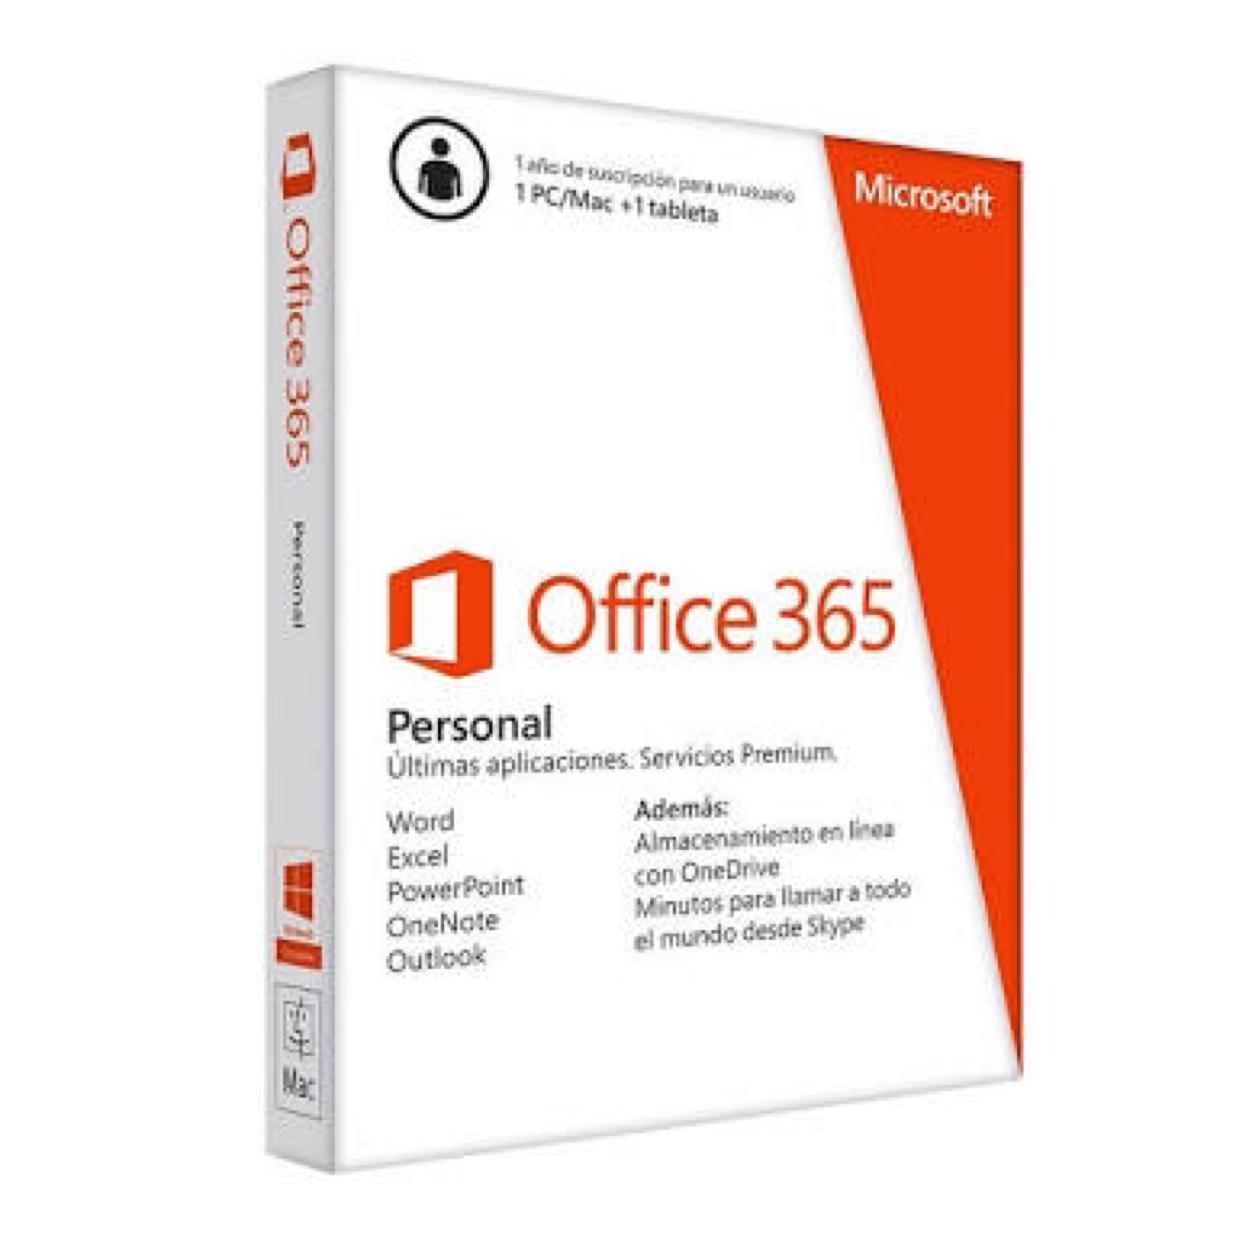 Tienda Telmex: Office 365 Personal